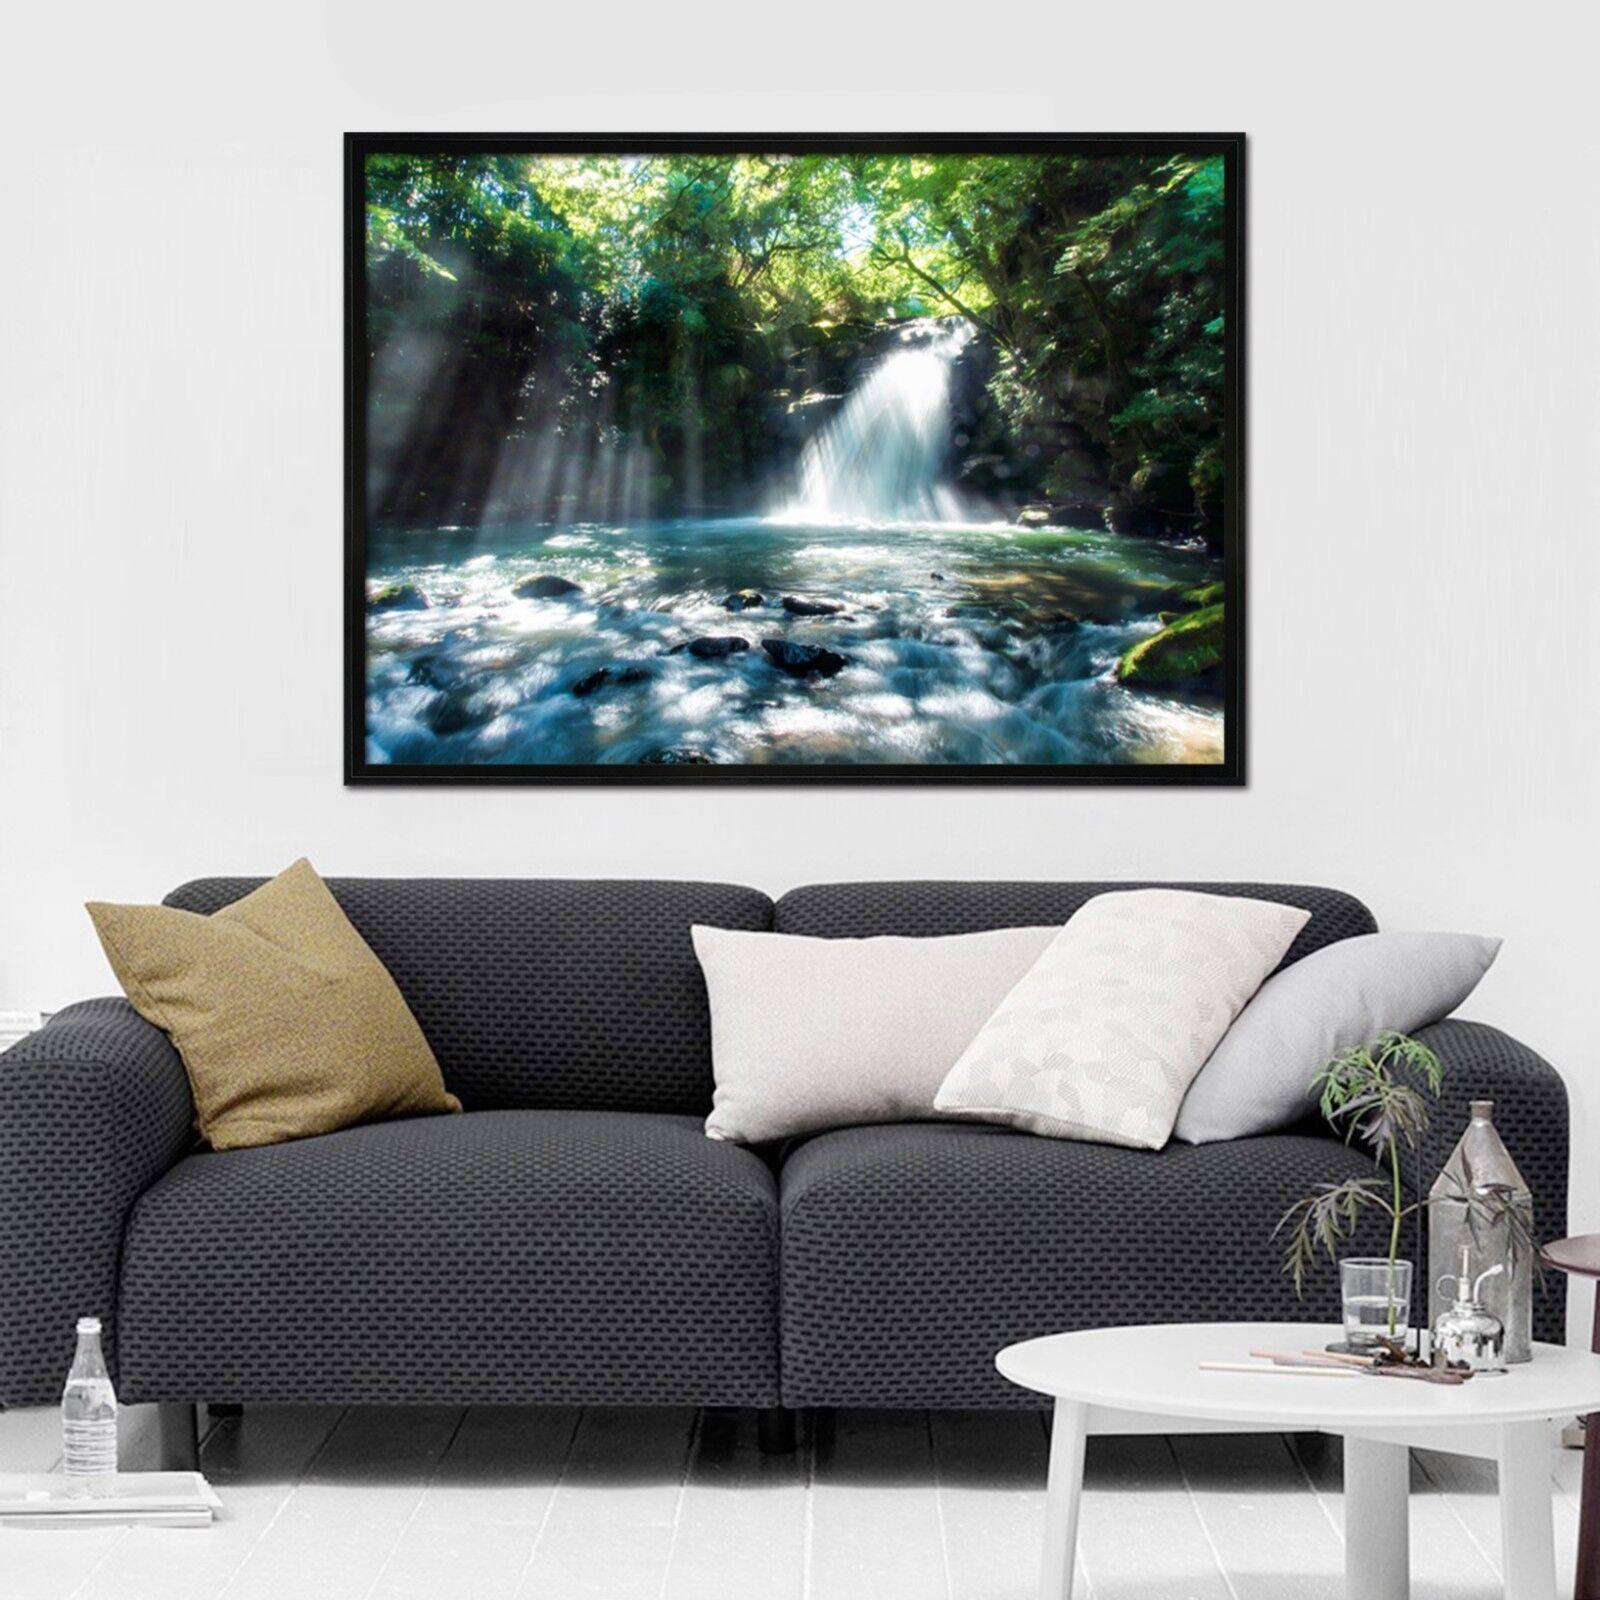 3D Tree eaufall 6 Framed affiche accueil Decor impression Painting Art AJ WALLPAPER